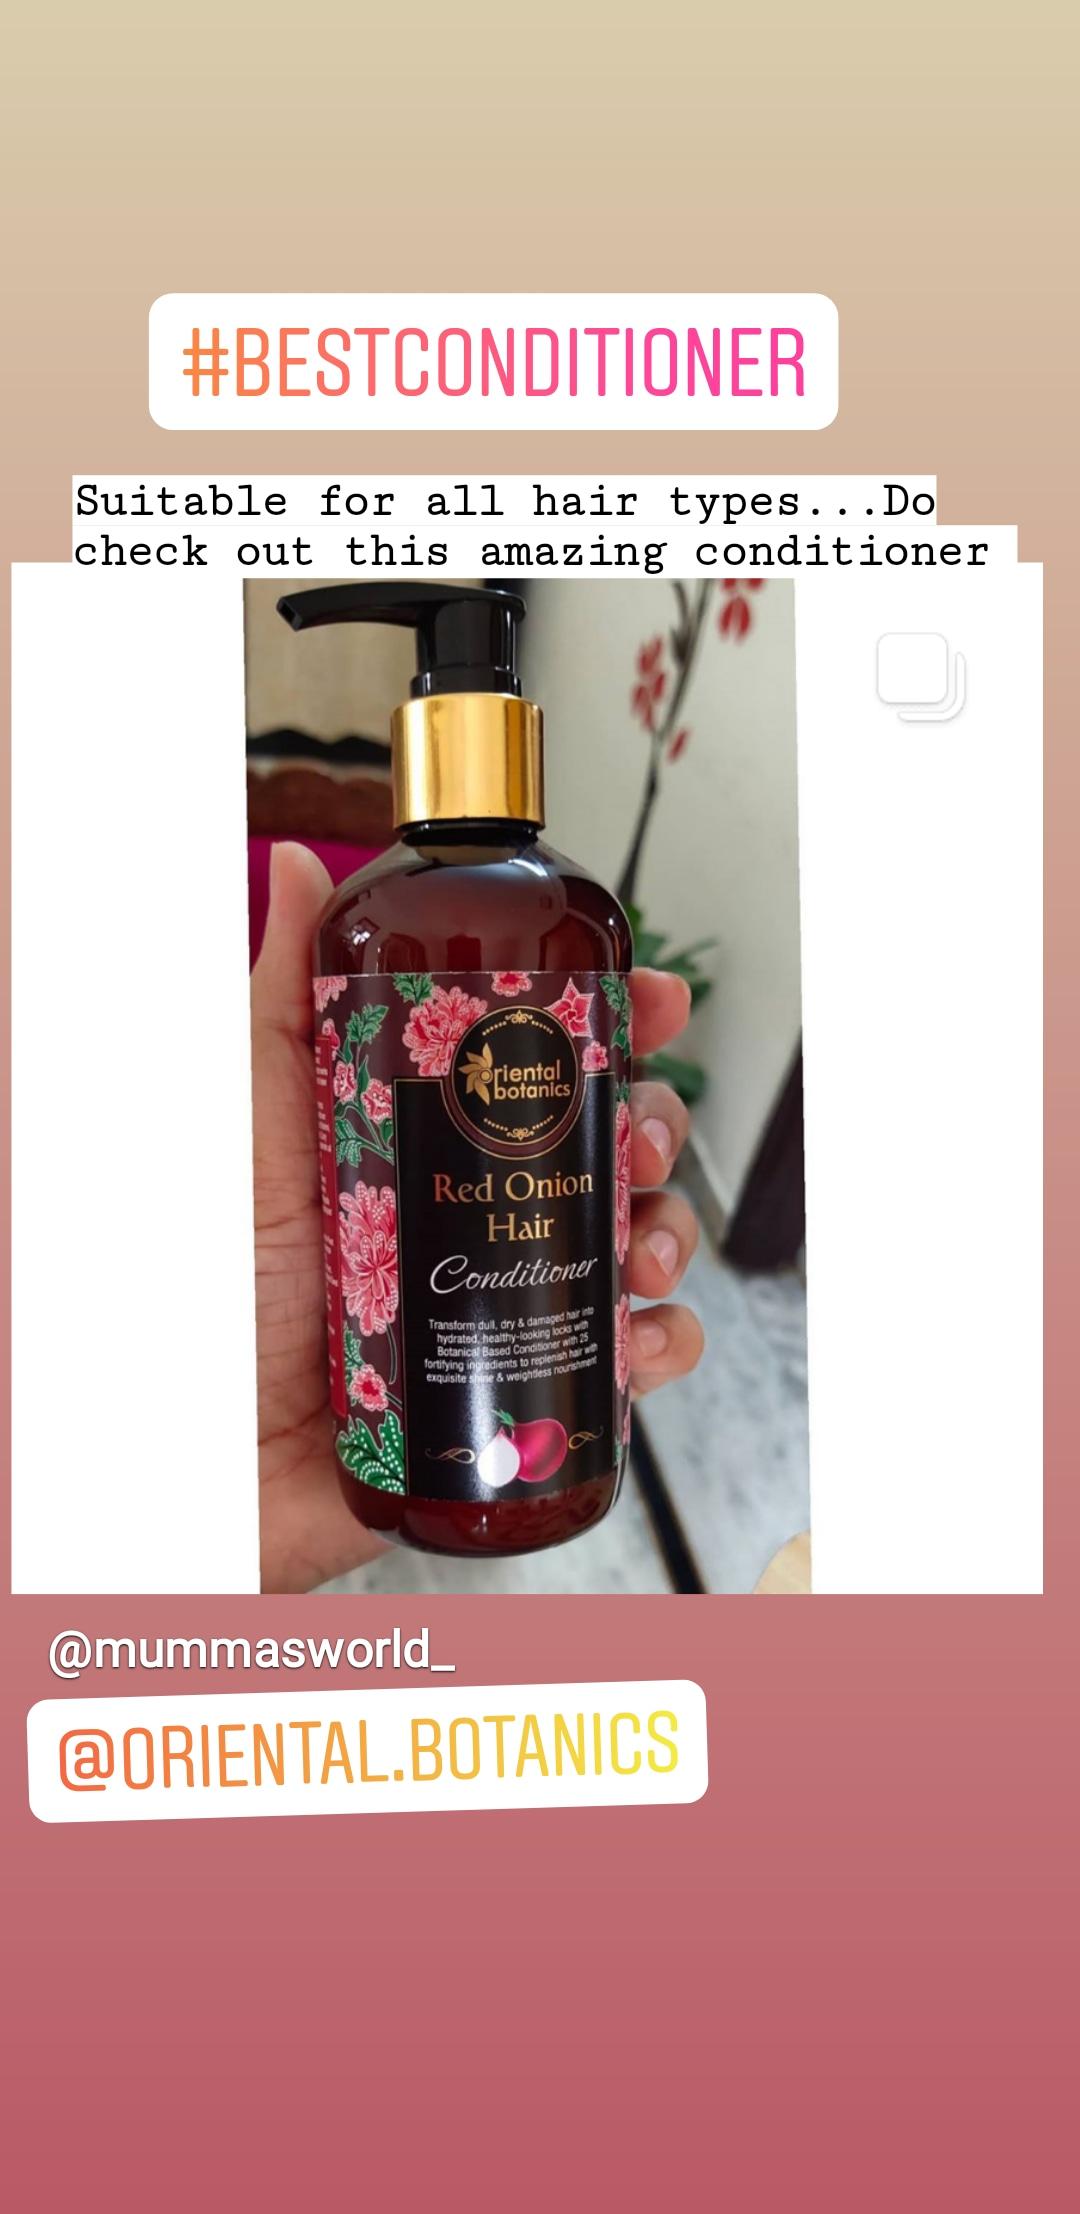 Oriental Botanics Red Onion Hair Conditioner-Very very effective-By sunita_yadav